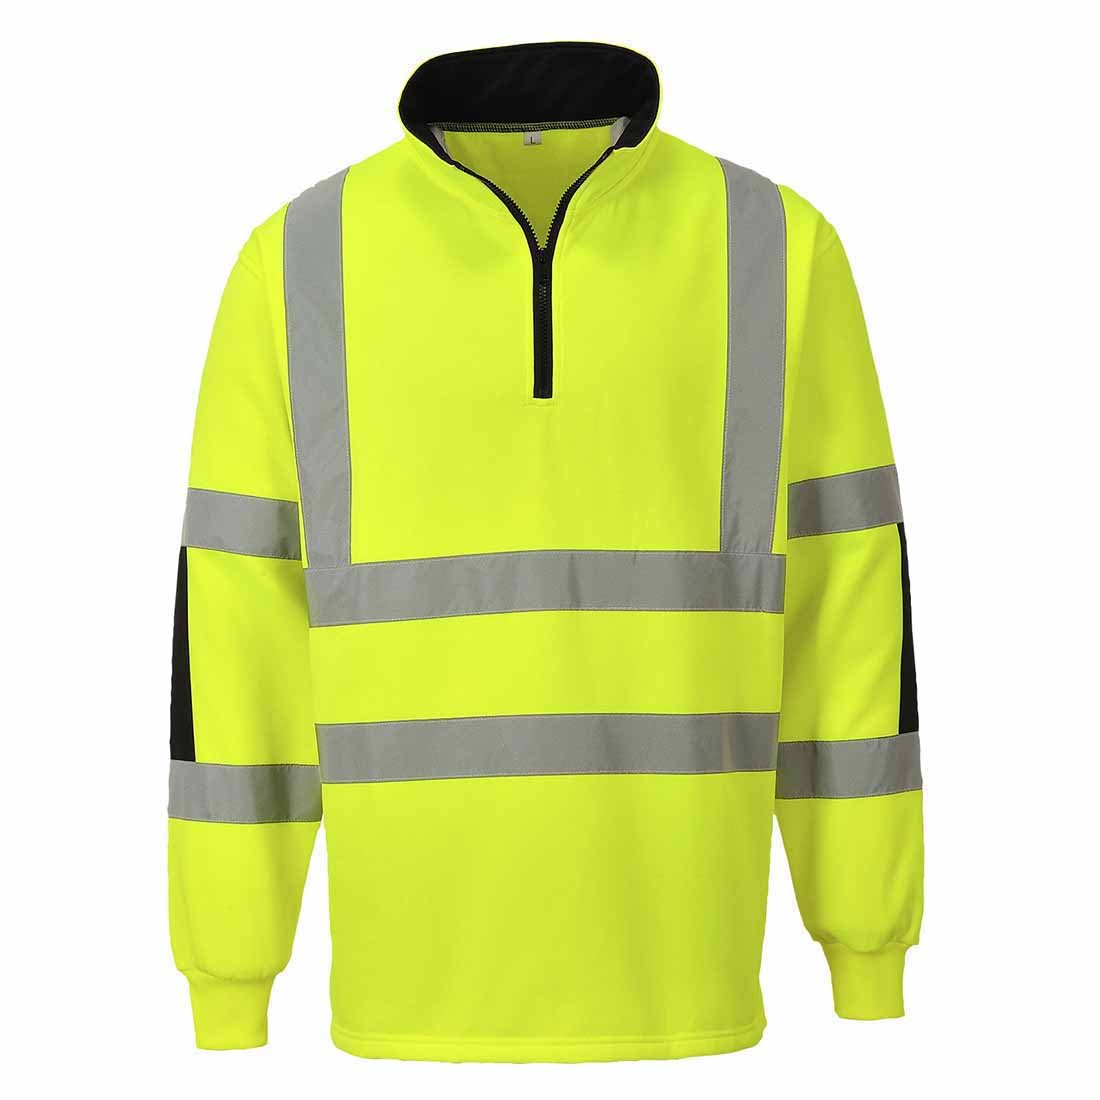 Portwest Xenon Hi Vis Rugby Sweatshirt - B308